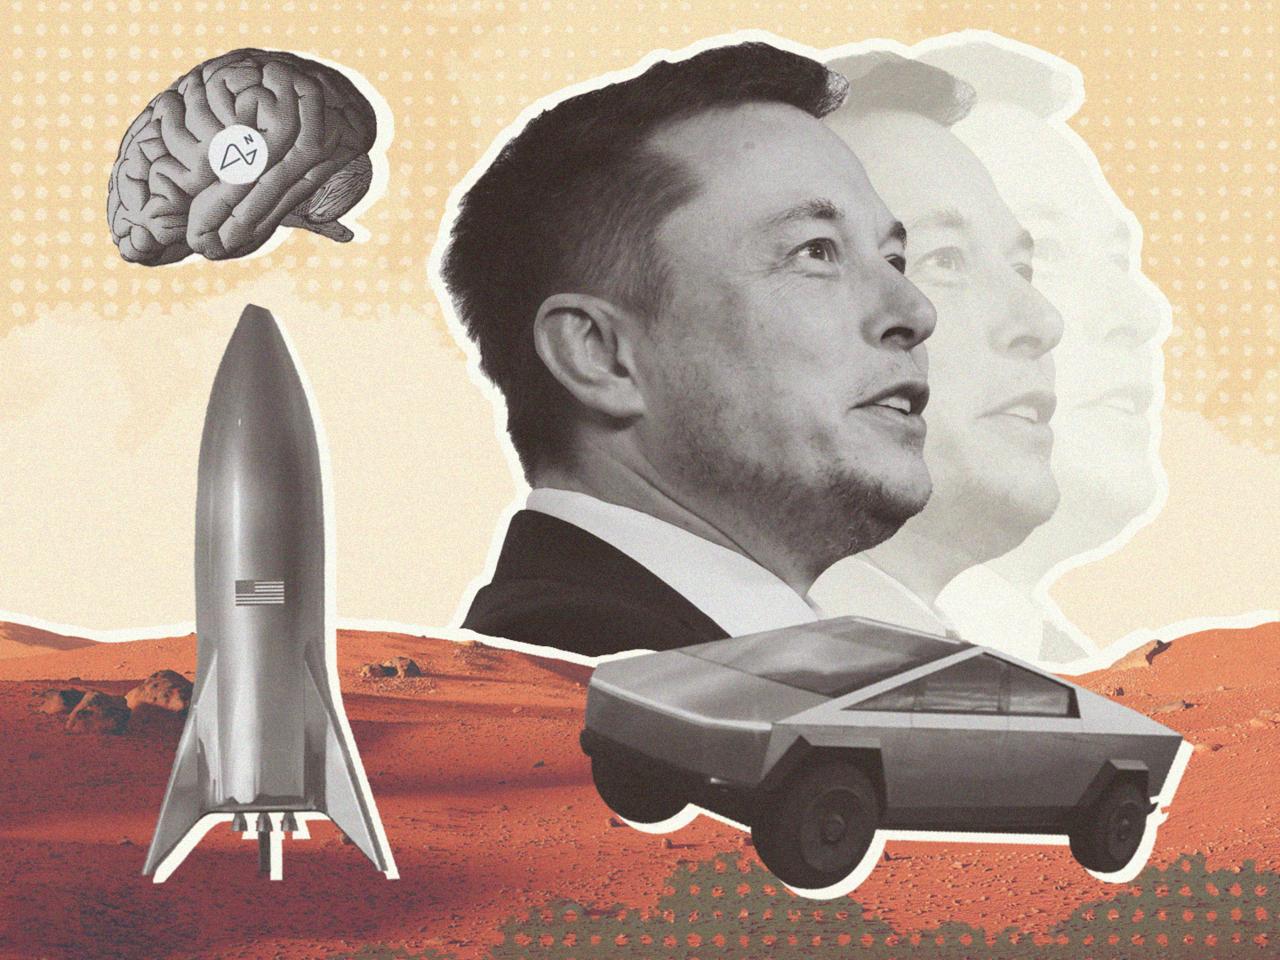 Musk Reads+